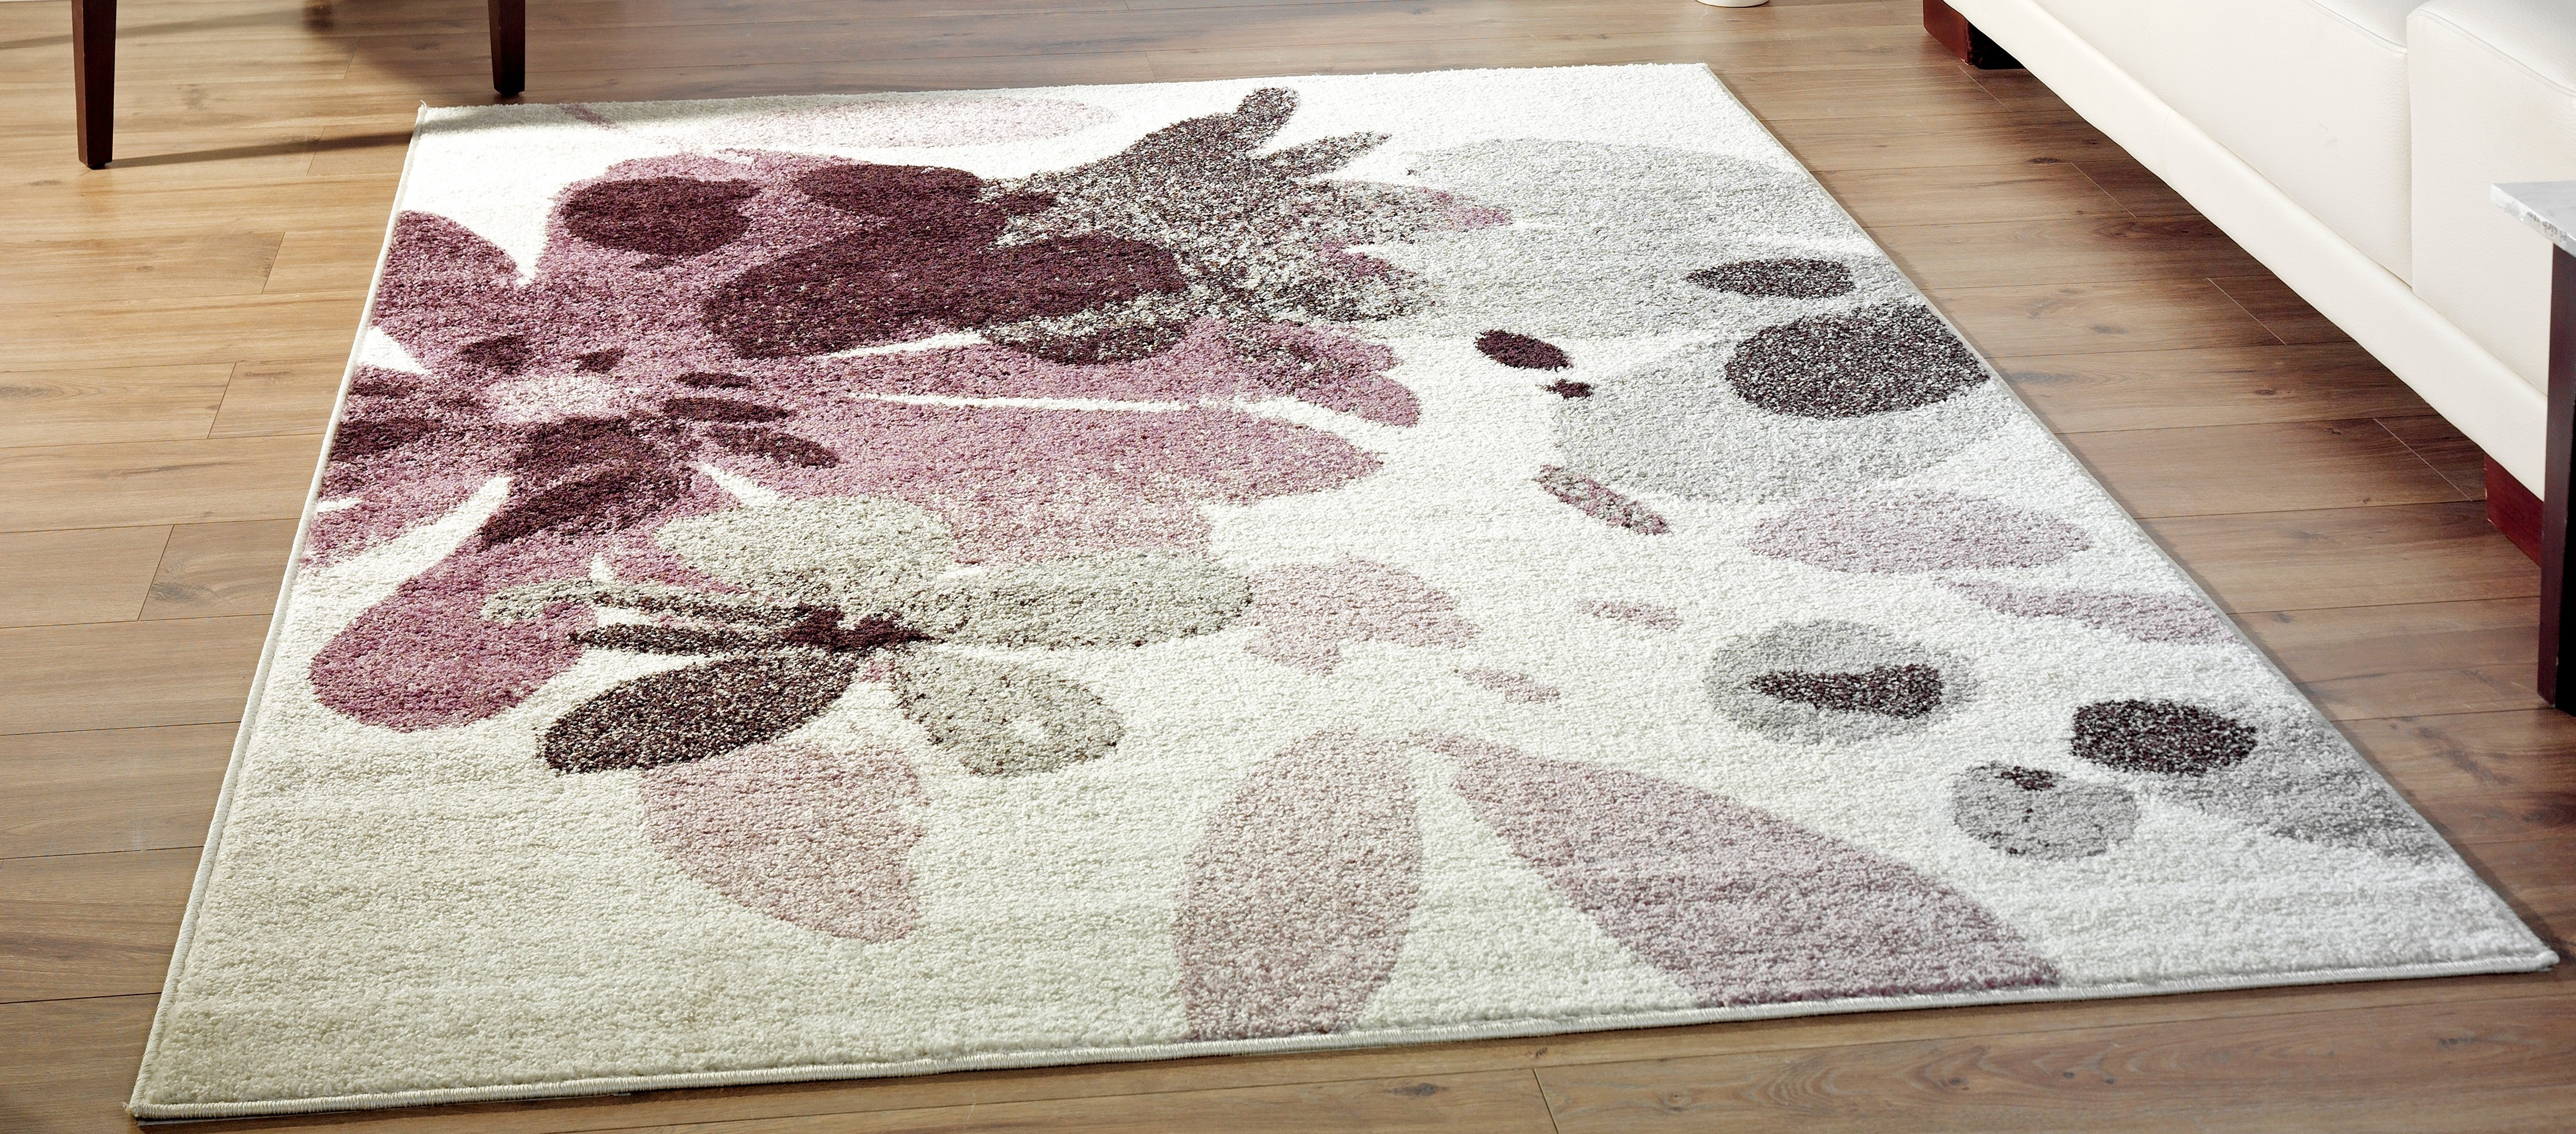 Sona-Lux tappeto Online Shop, i tappeti ordinano online